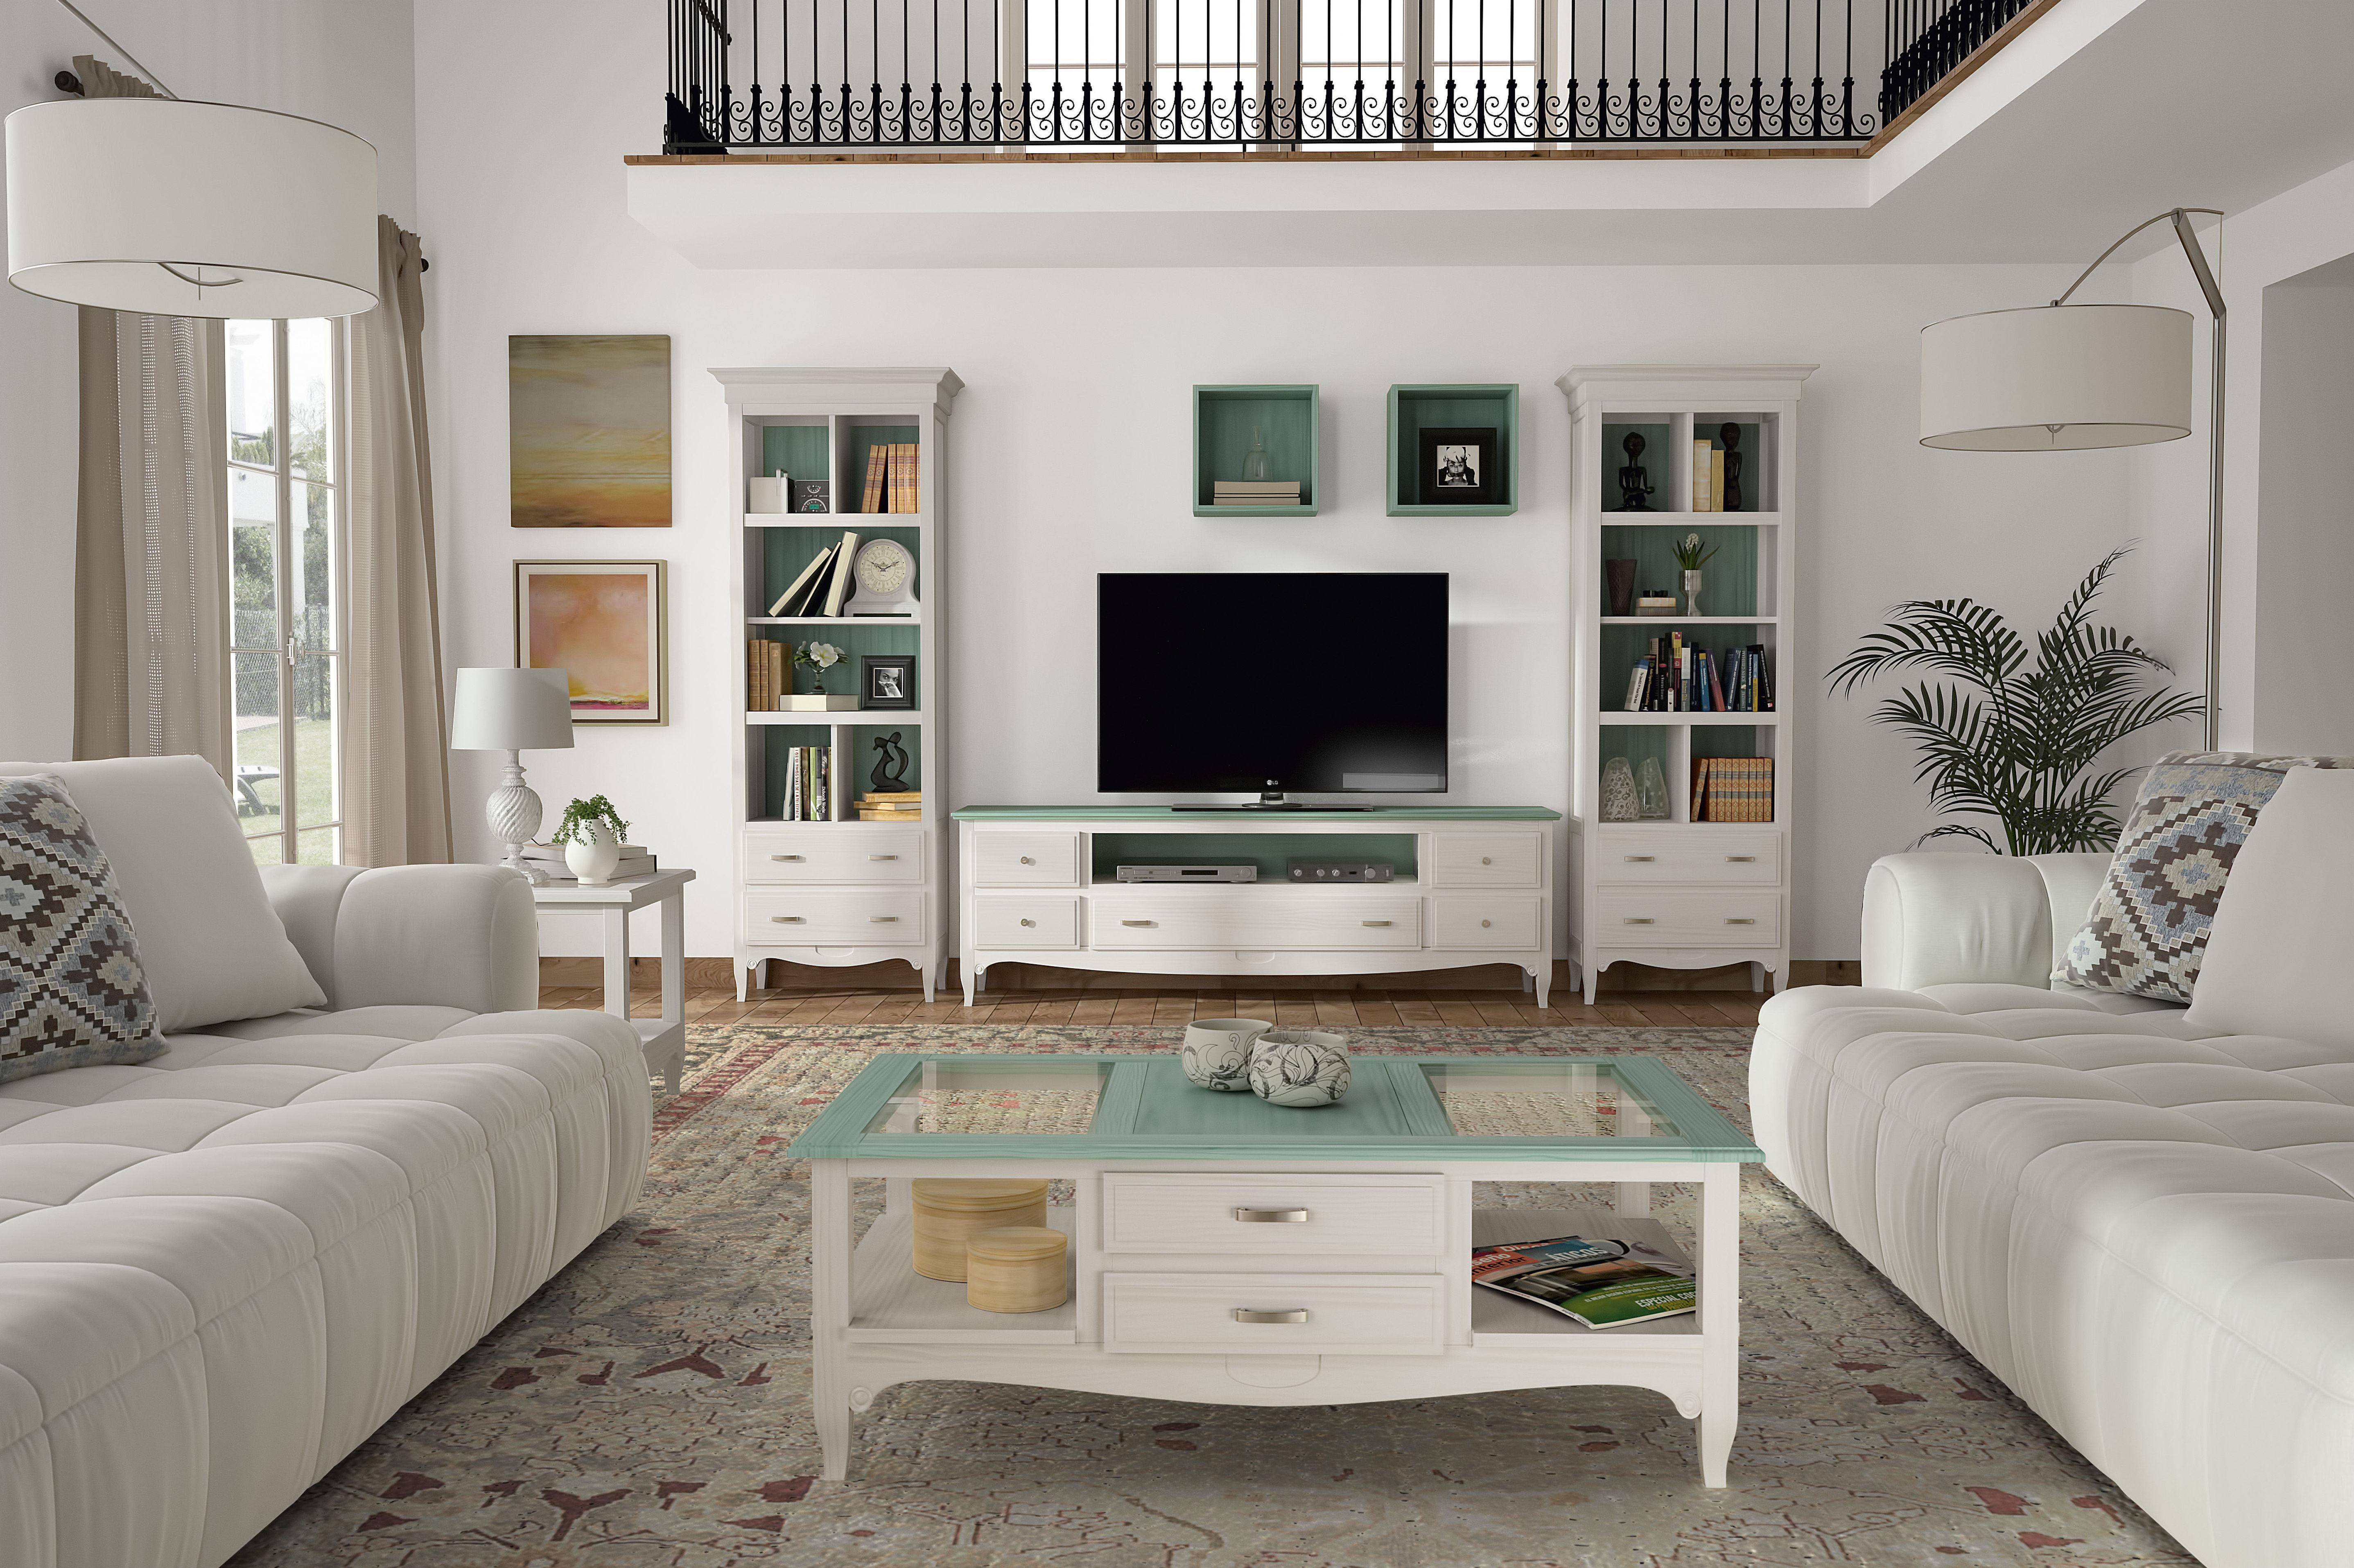 foto 2 de muebles en m laga k barato muebles